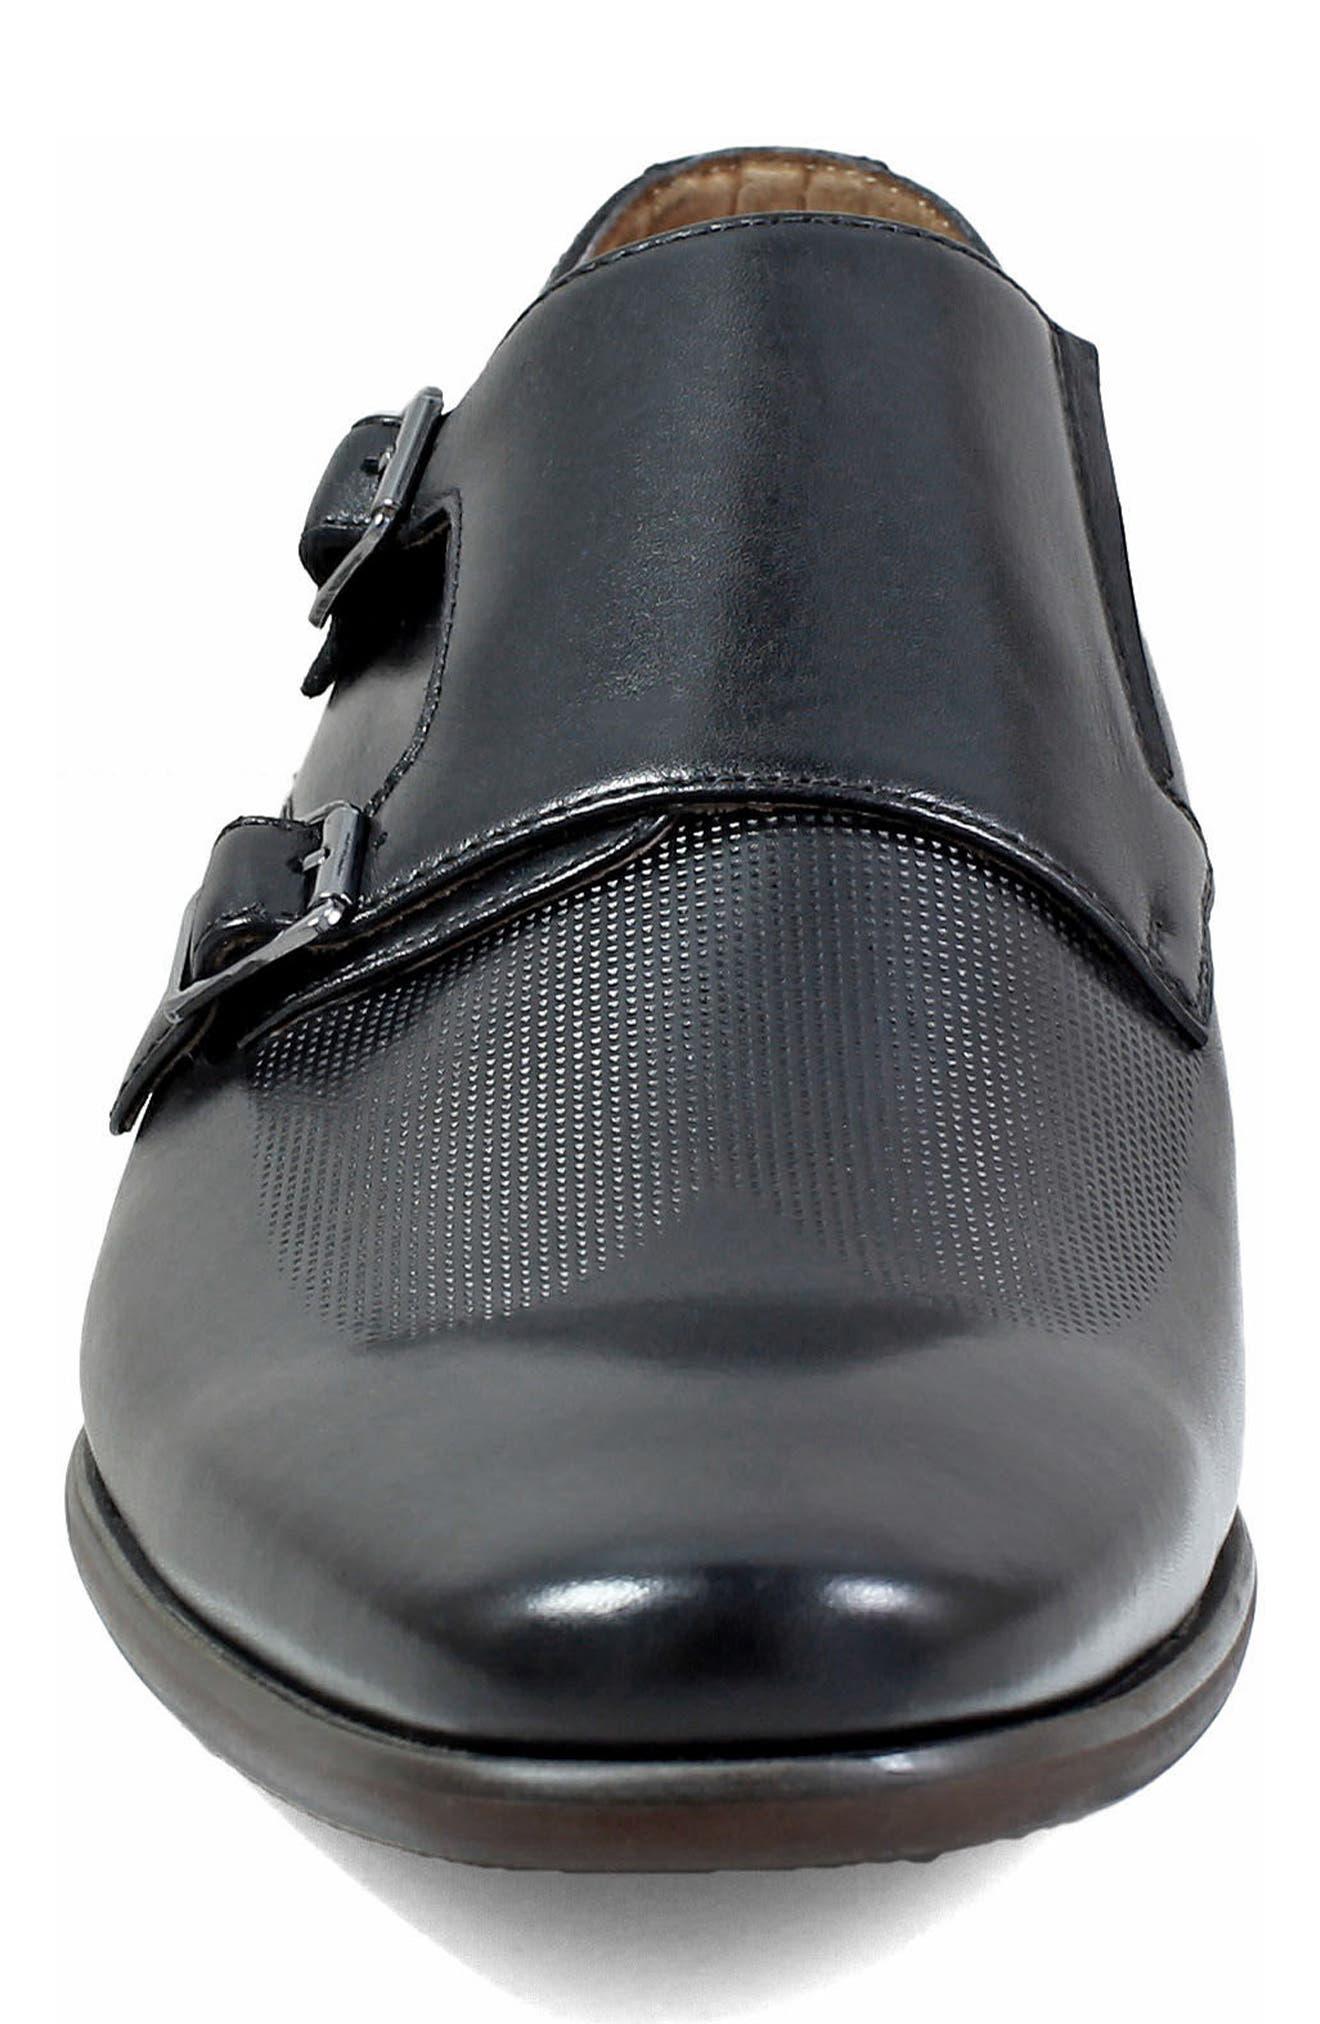 FLORSHEIM, Postino Textured Double Strap Monk Shoe, Alternate thumbnail 4, color, BLACK LEATHER